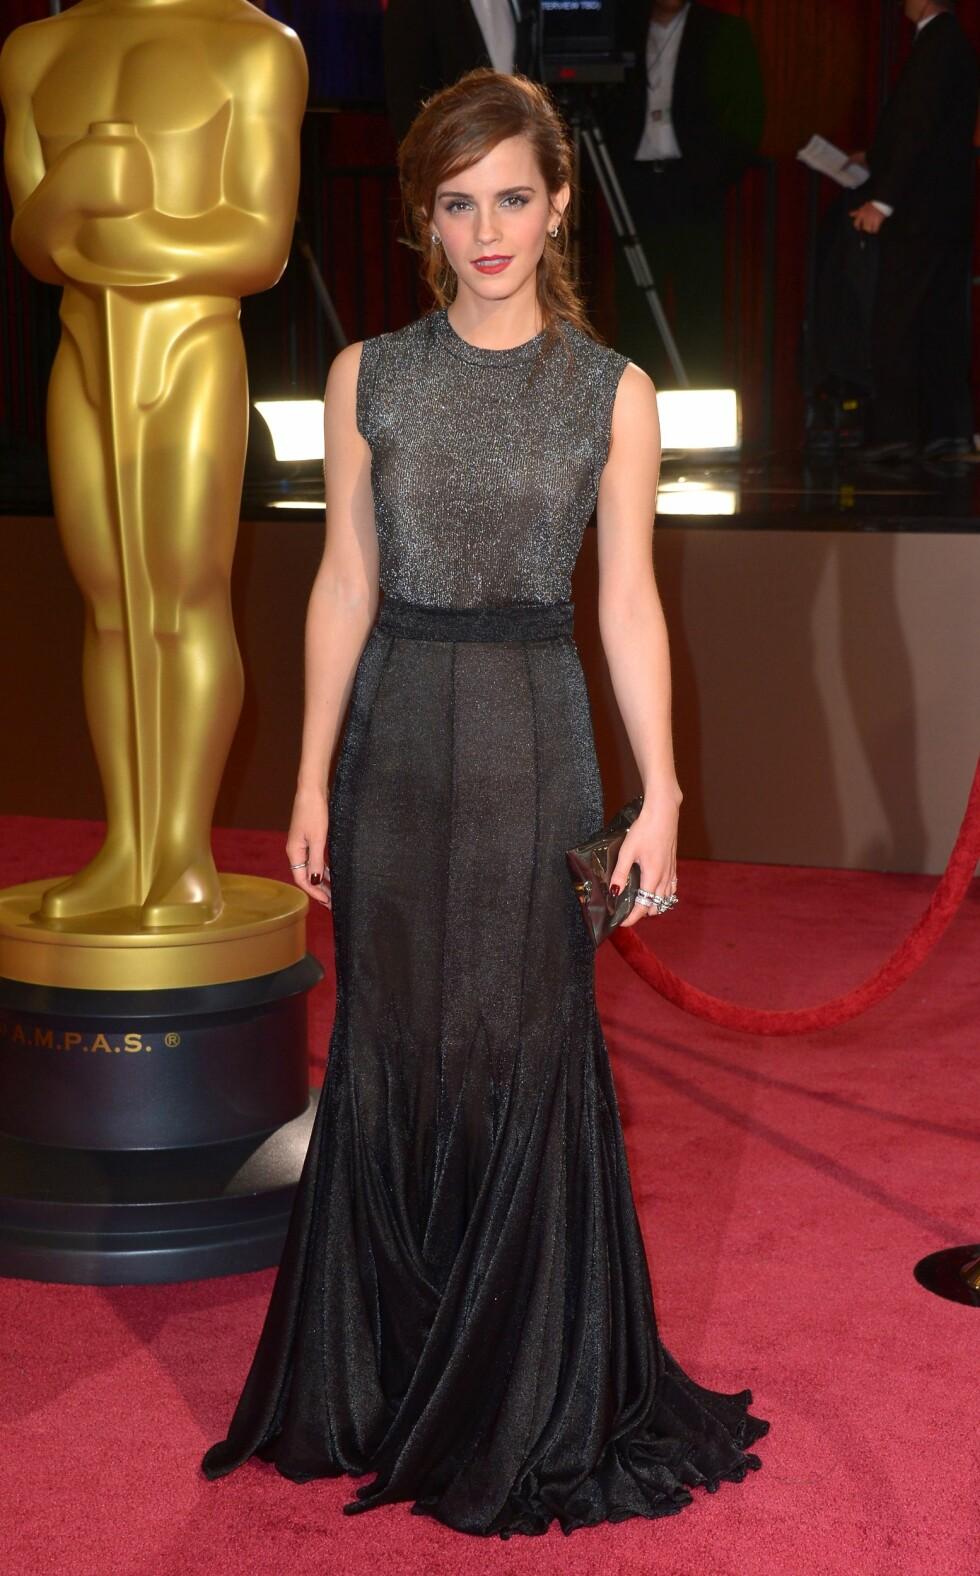 Harry Potter-stjernen Emma Watson (23) var nydelig i en svart/metallisk kreasjon. Foto: REX/Stewart Cook/All Over Press